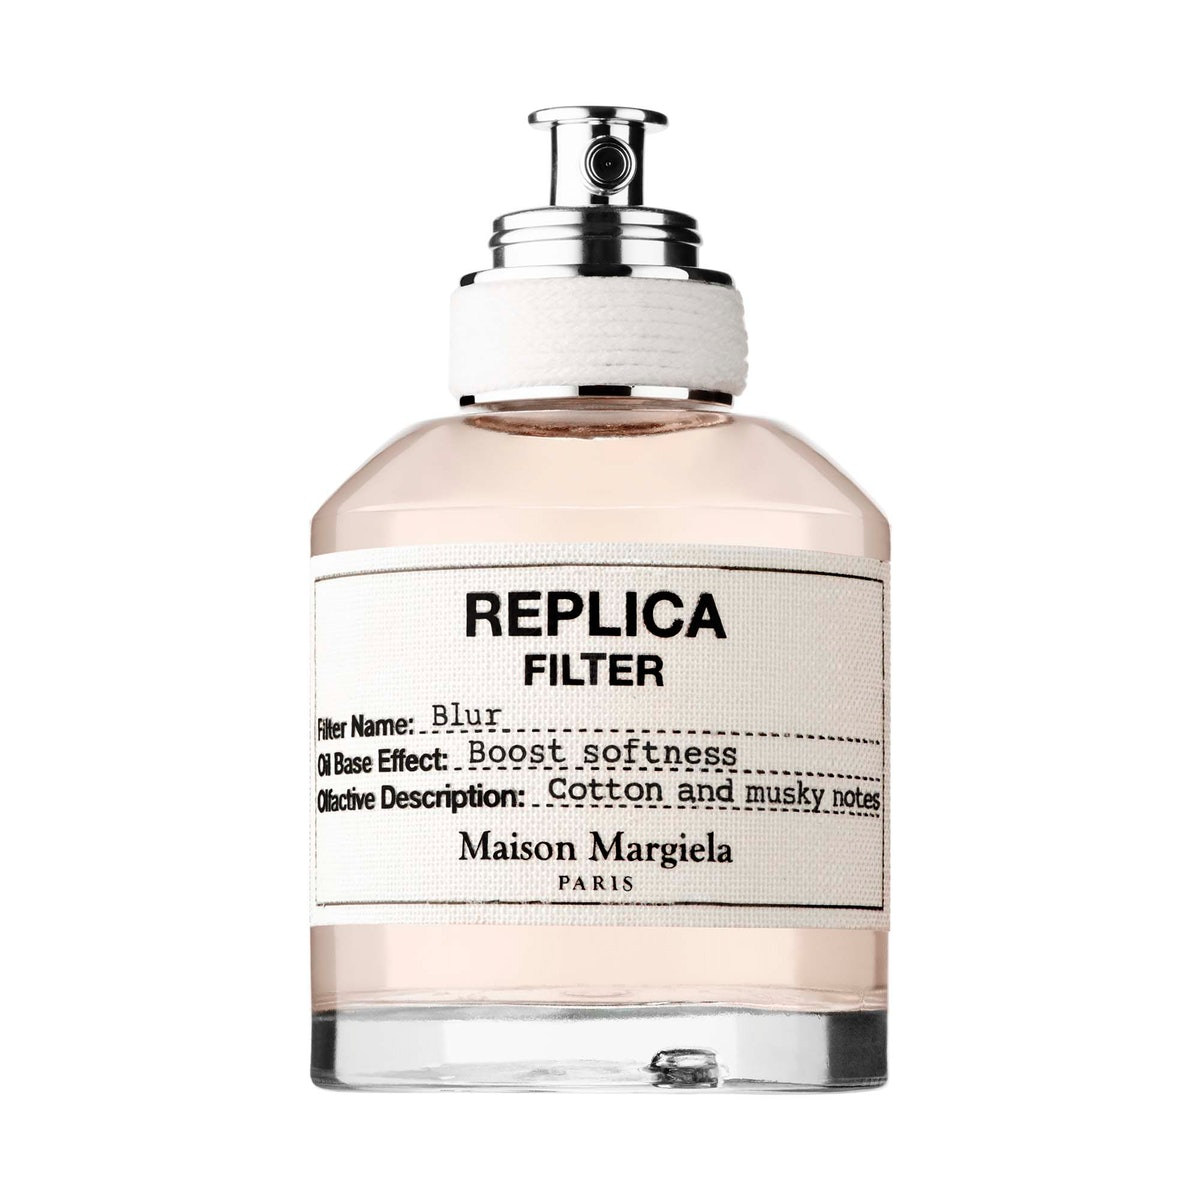 Maison Margiela 'REPLICA' Filter: Blur